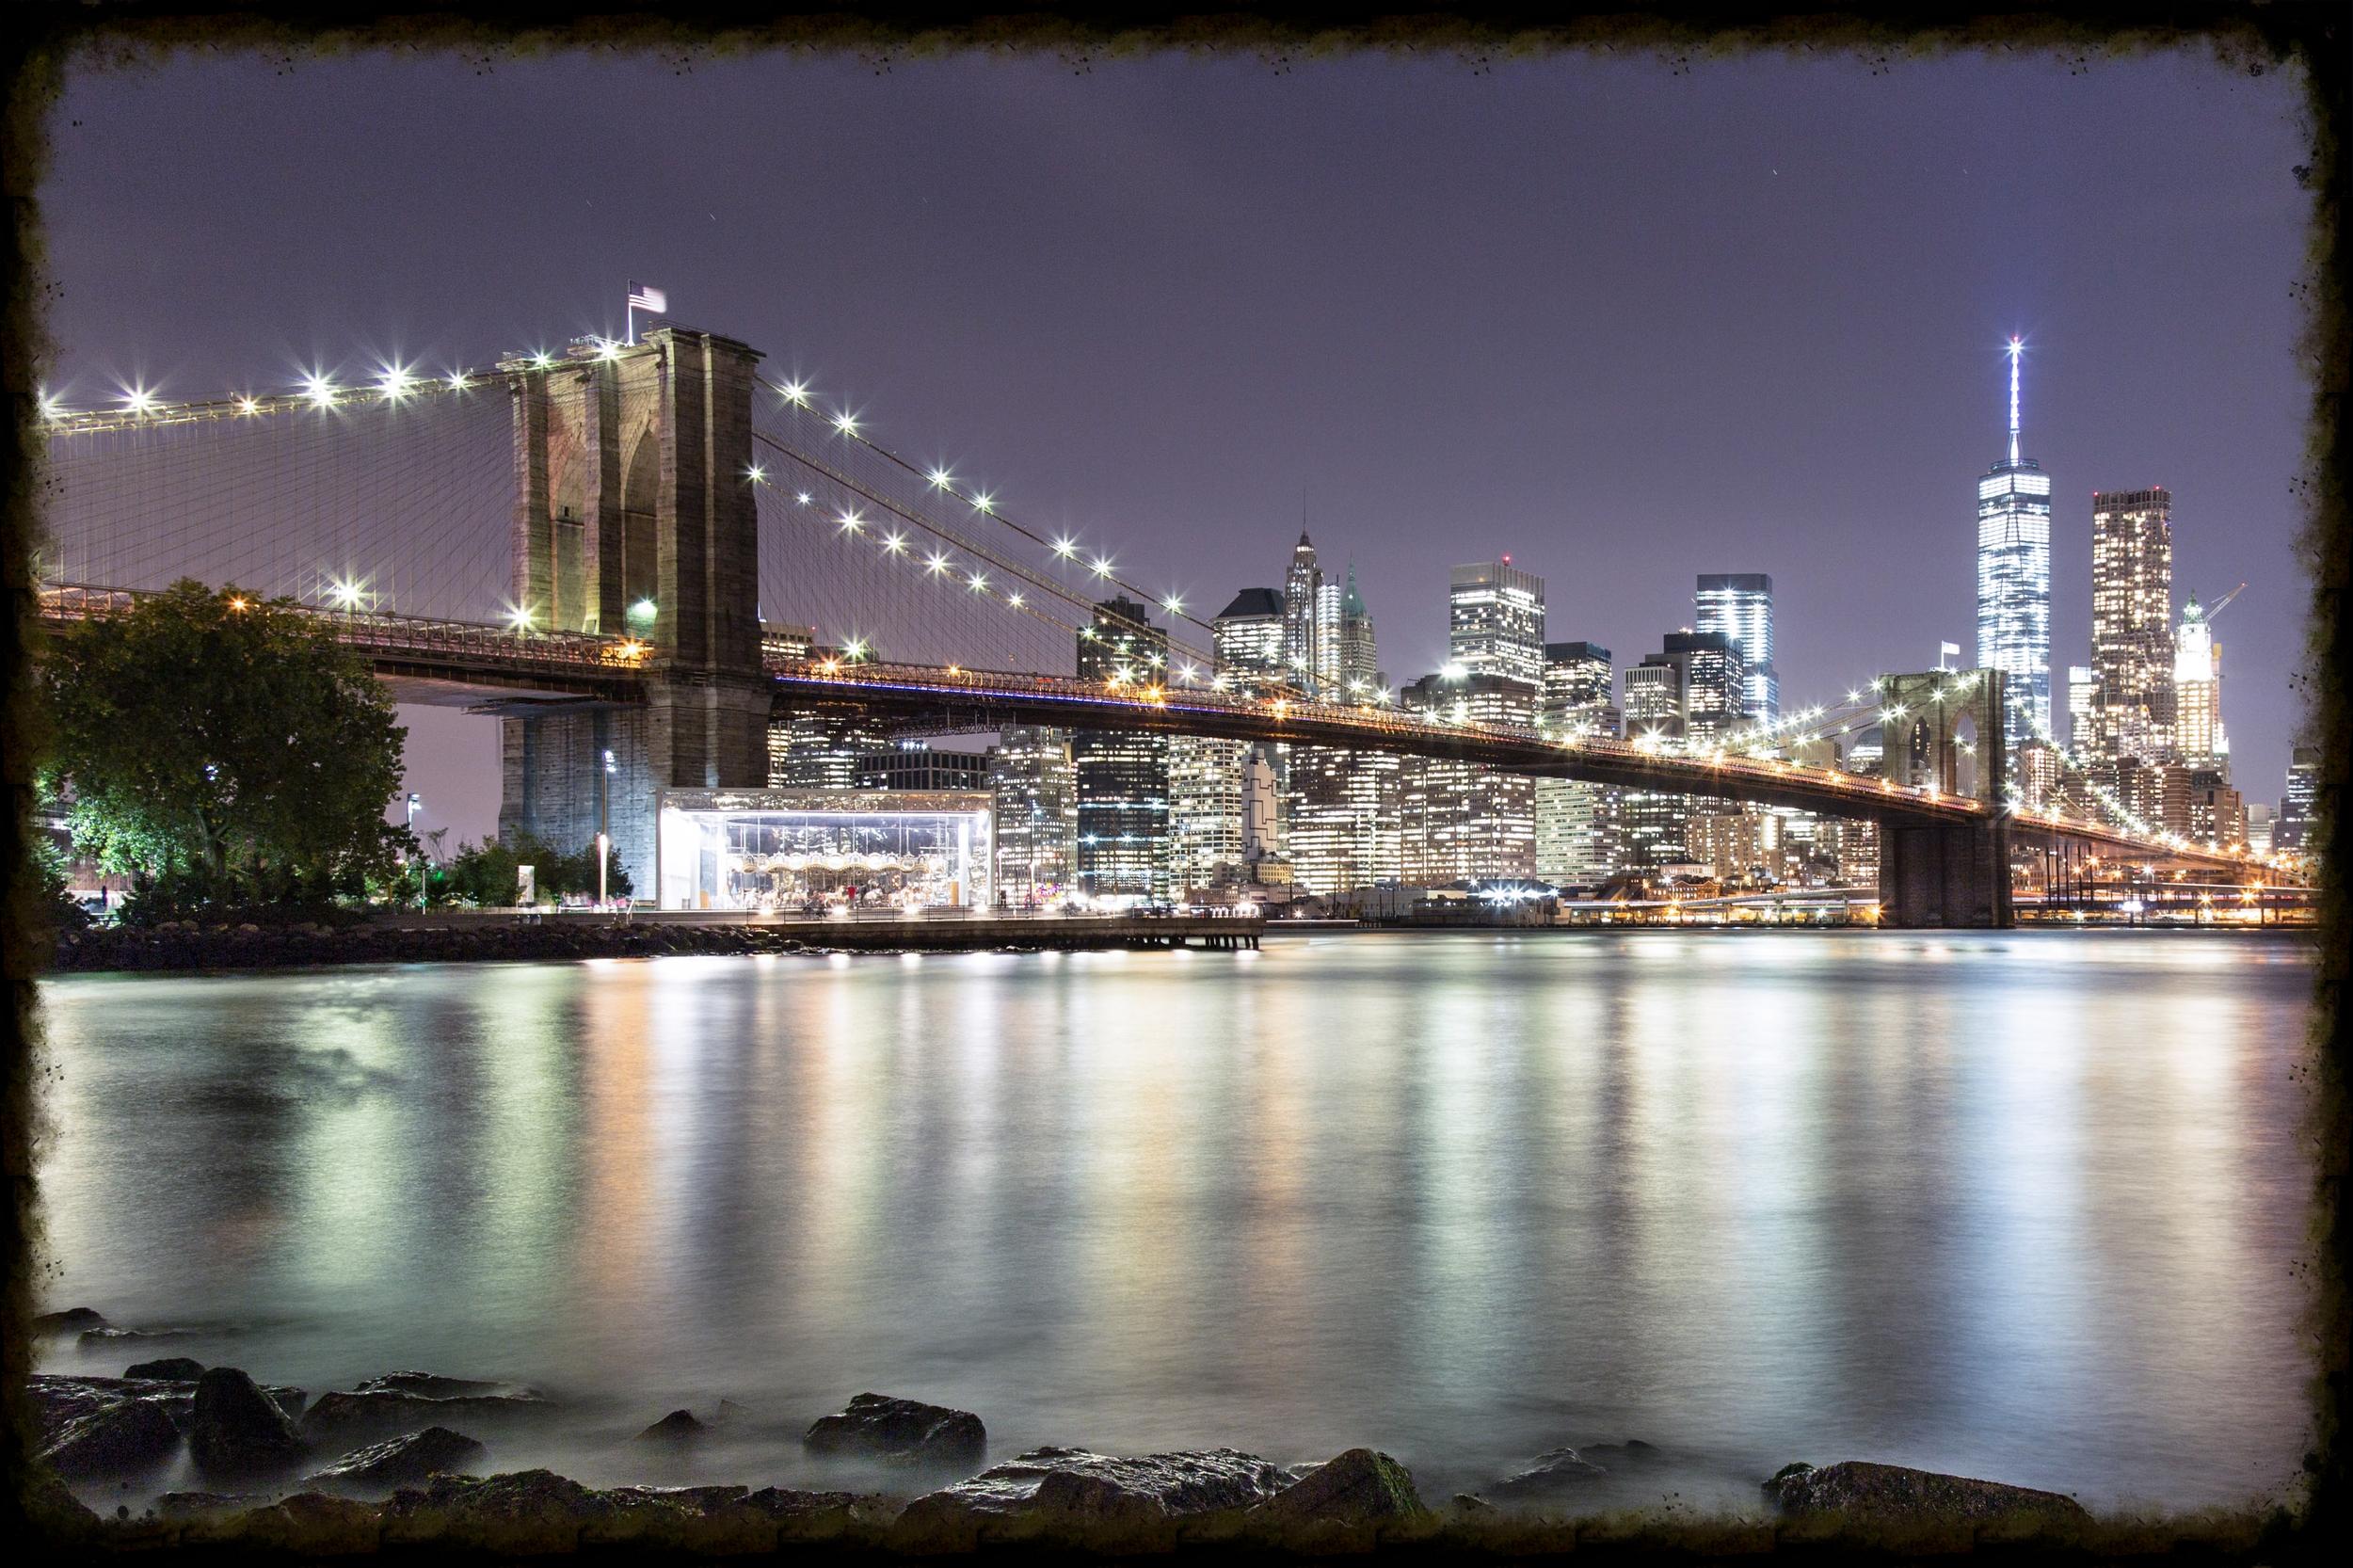 Brooklyn_Bridge .CR2-Color-LR ONLY-2.jpg